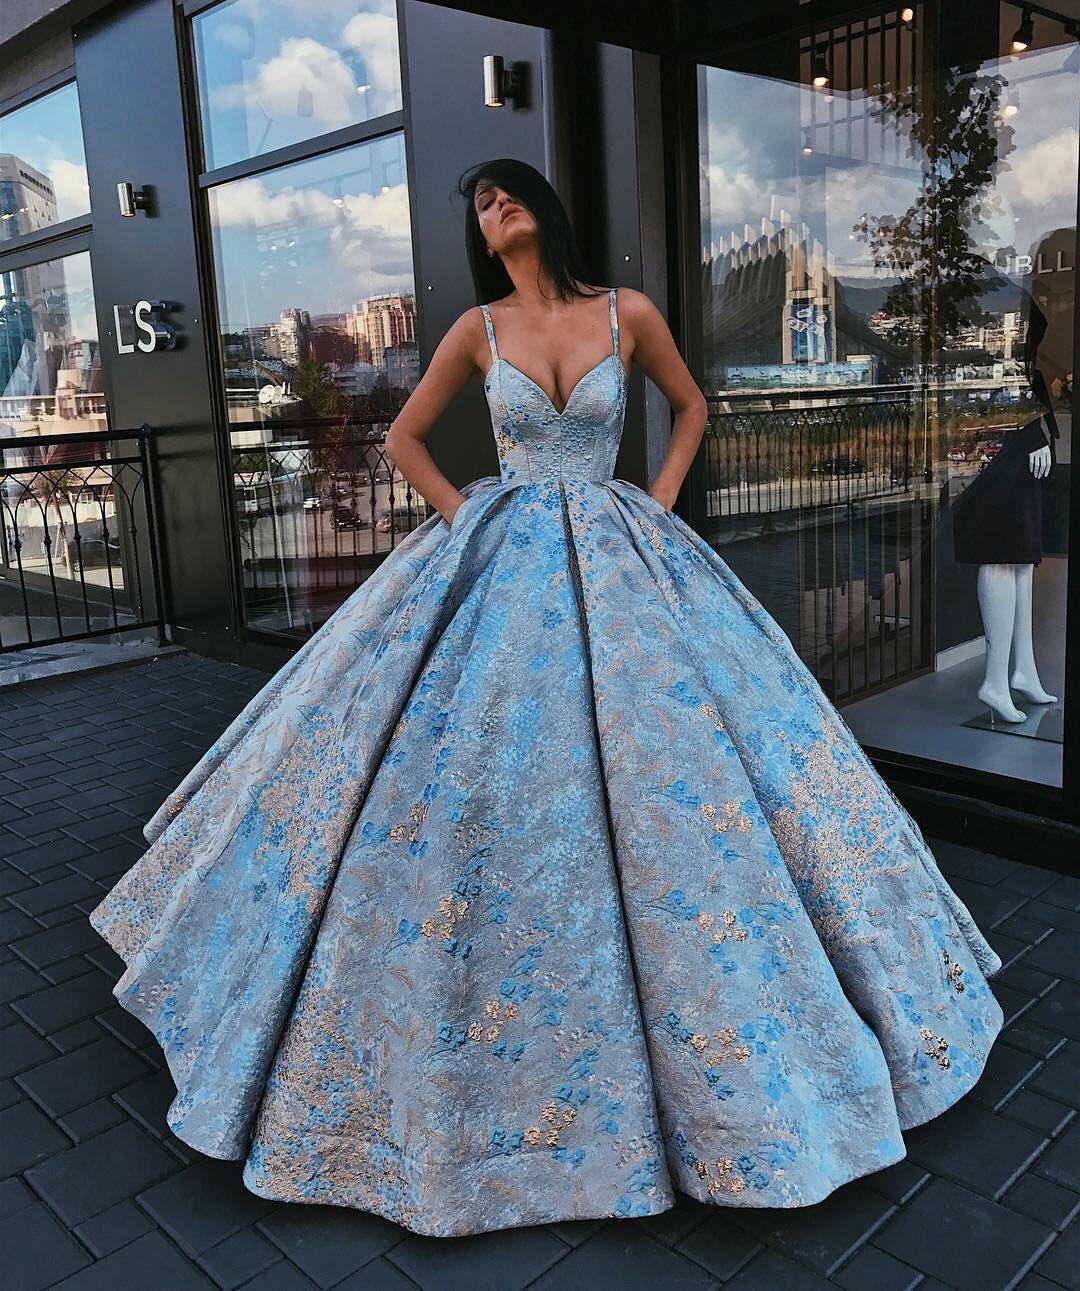 Gigantic Cinderella dress